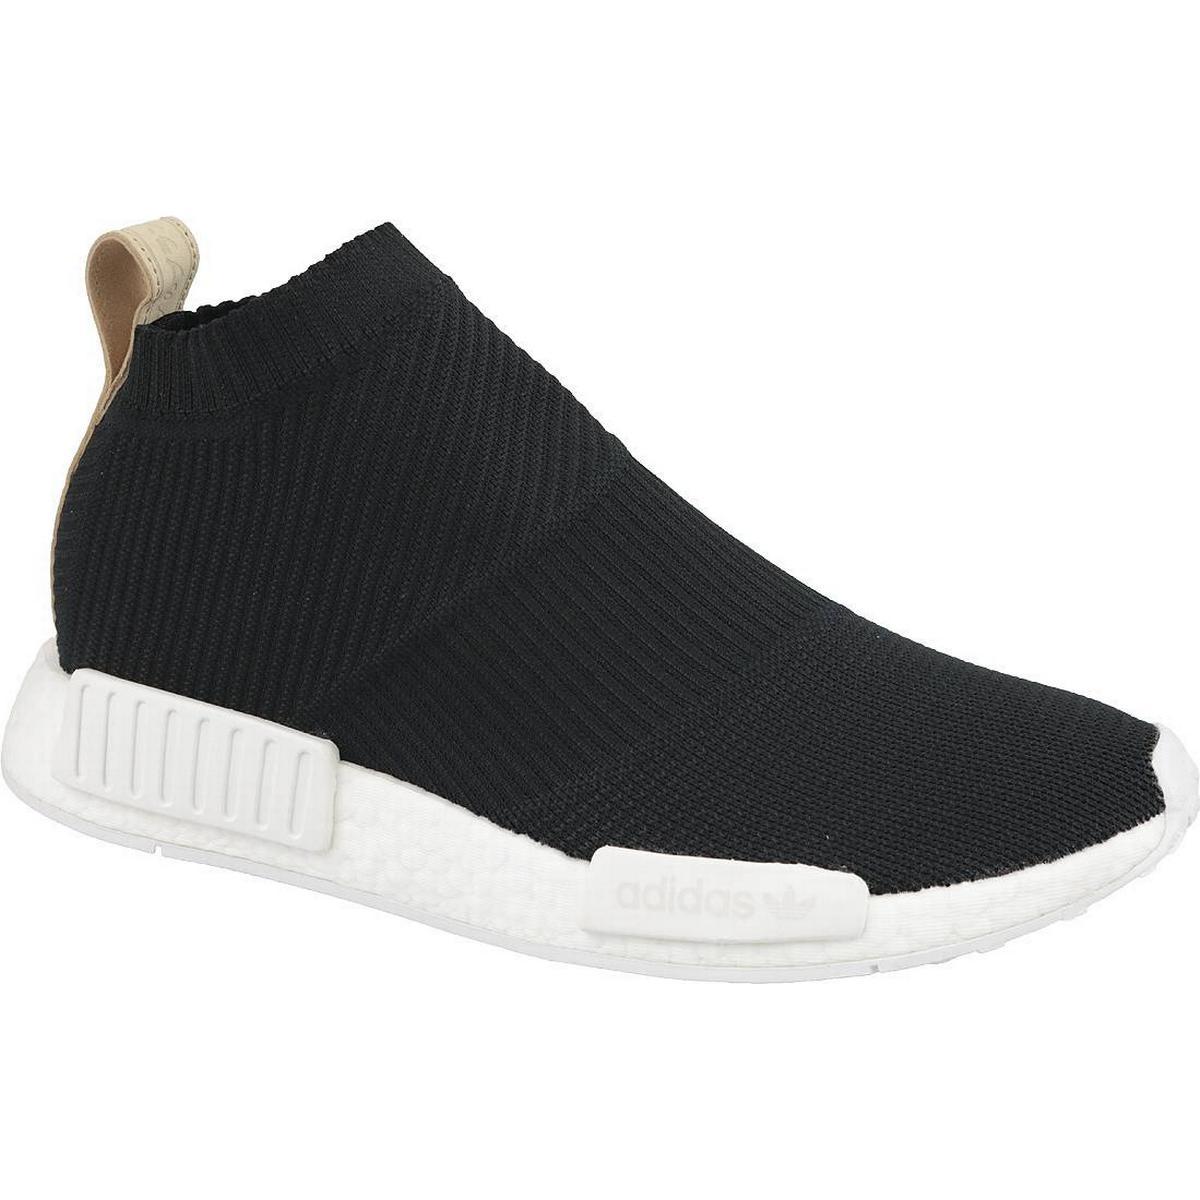 Adidas Originals NMD CS1 Primeknit Skor Core BlackGum